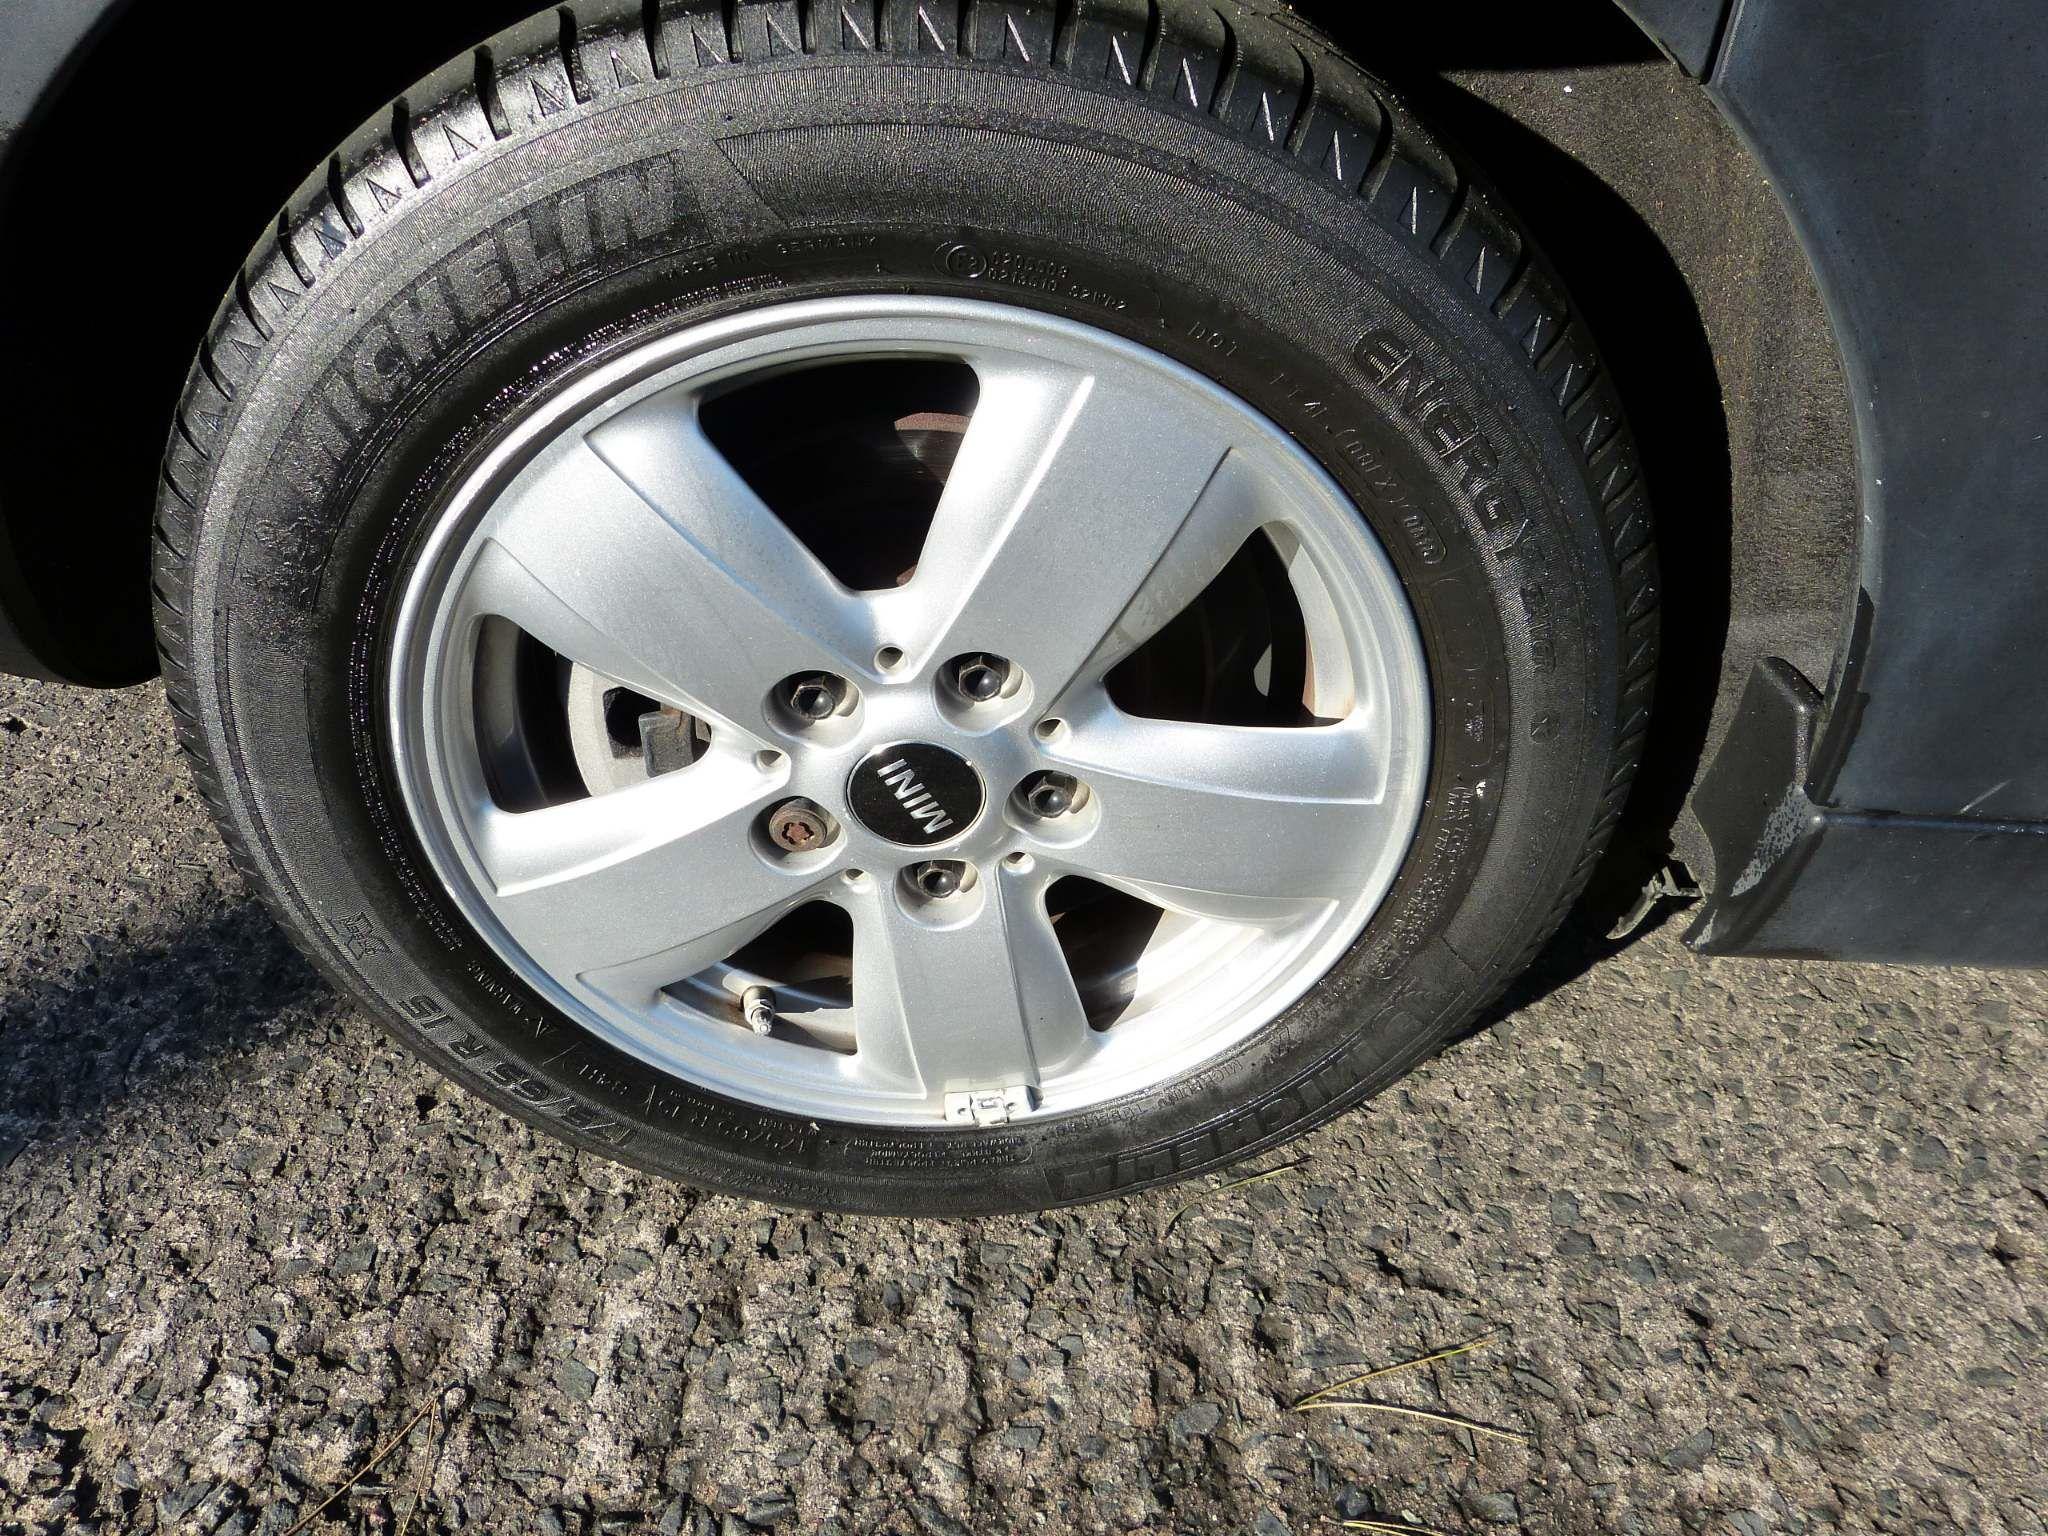 2016 MINI Hatch 1.5 Cooper (s/s) Petrol Manual  – Beechlawn Motors Belfast full